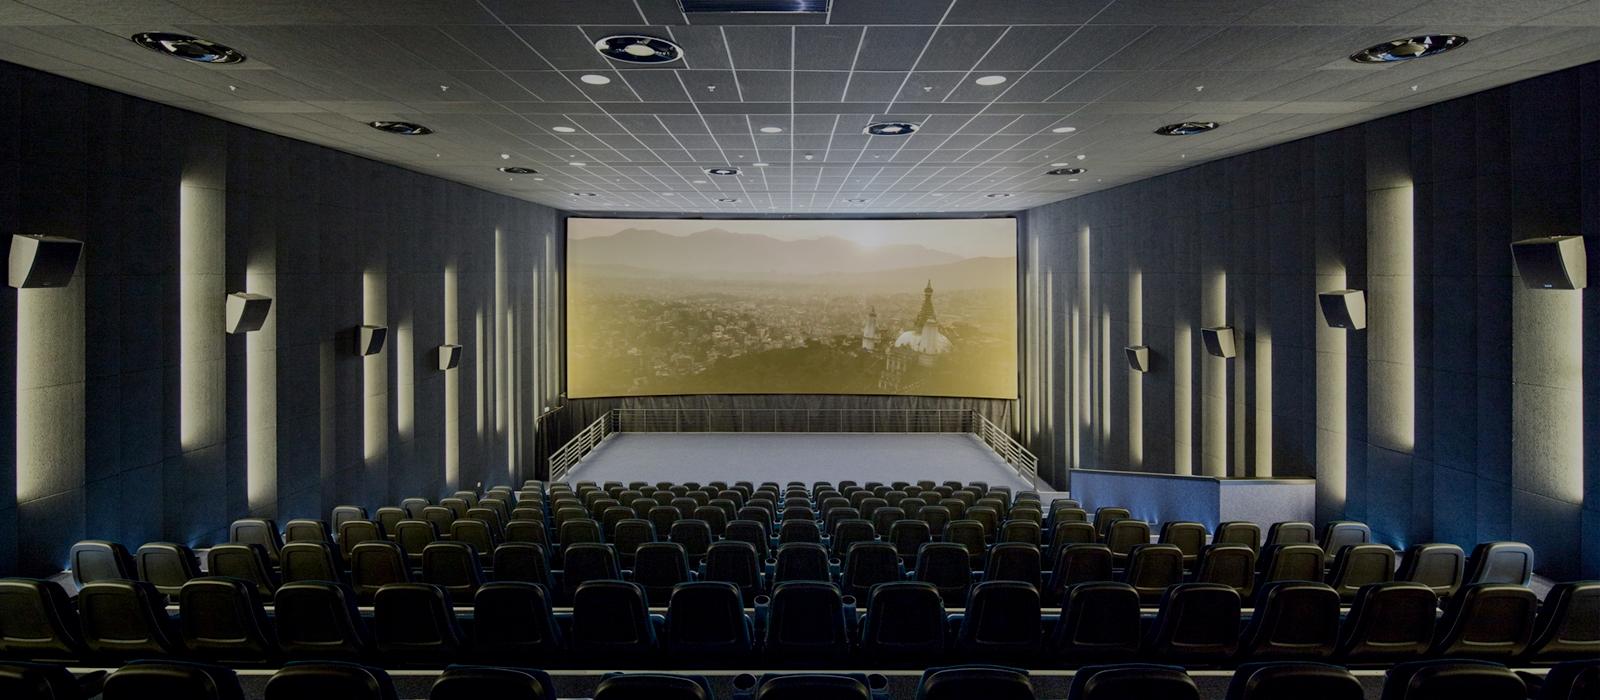 ТРЦ Gagarinn Plaza